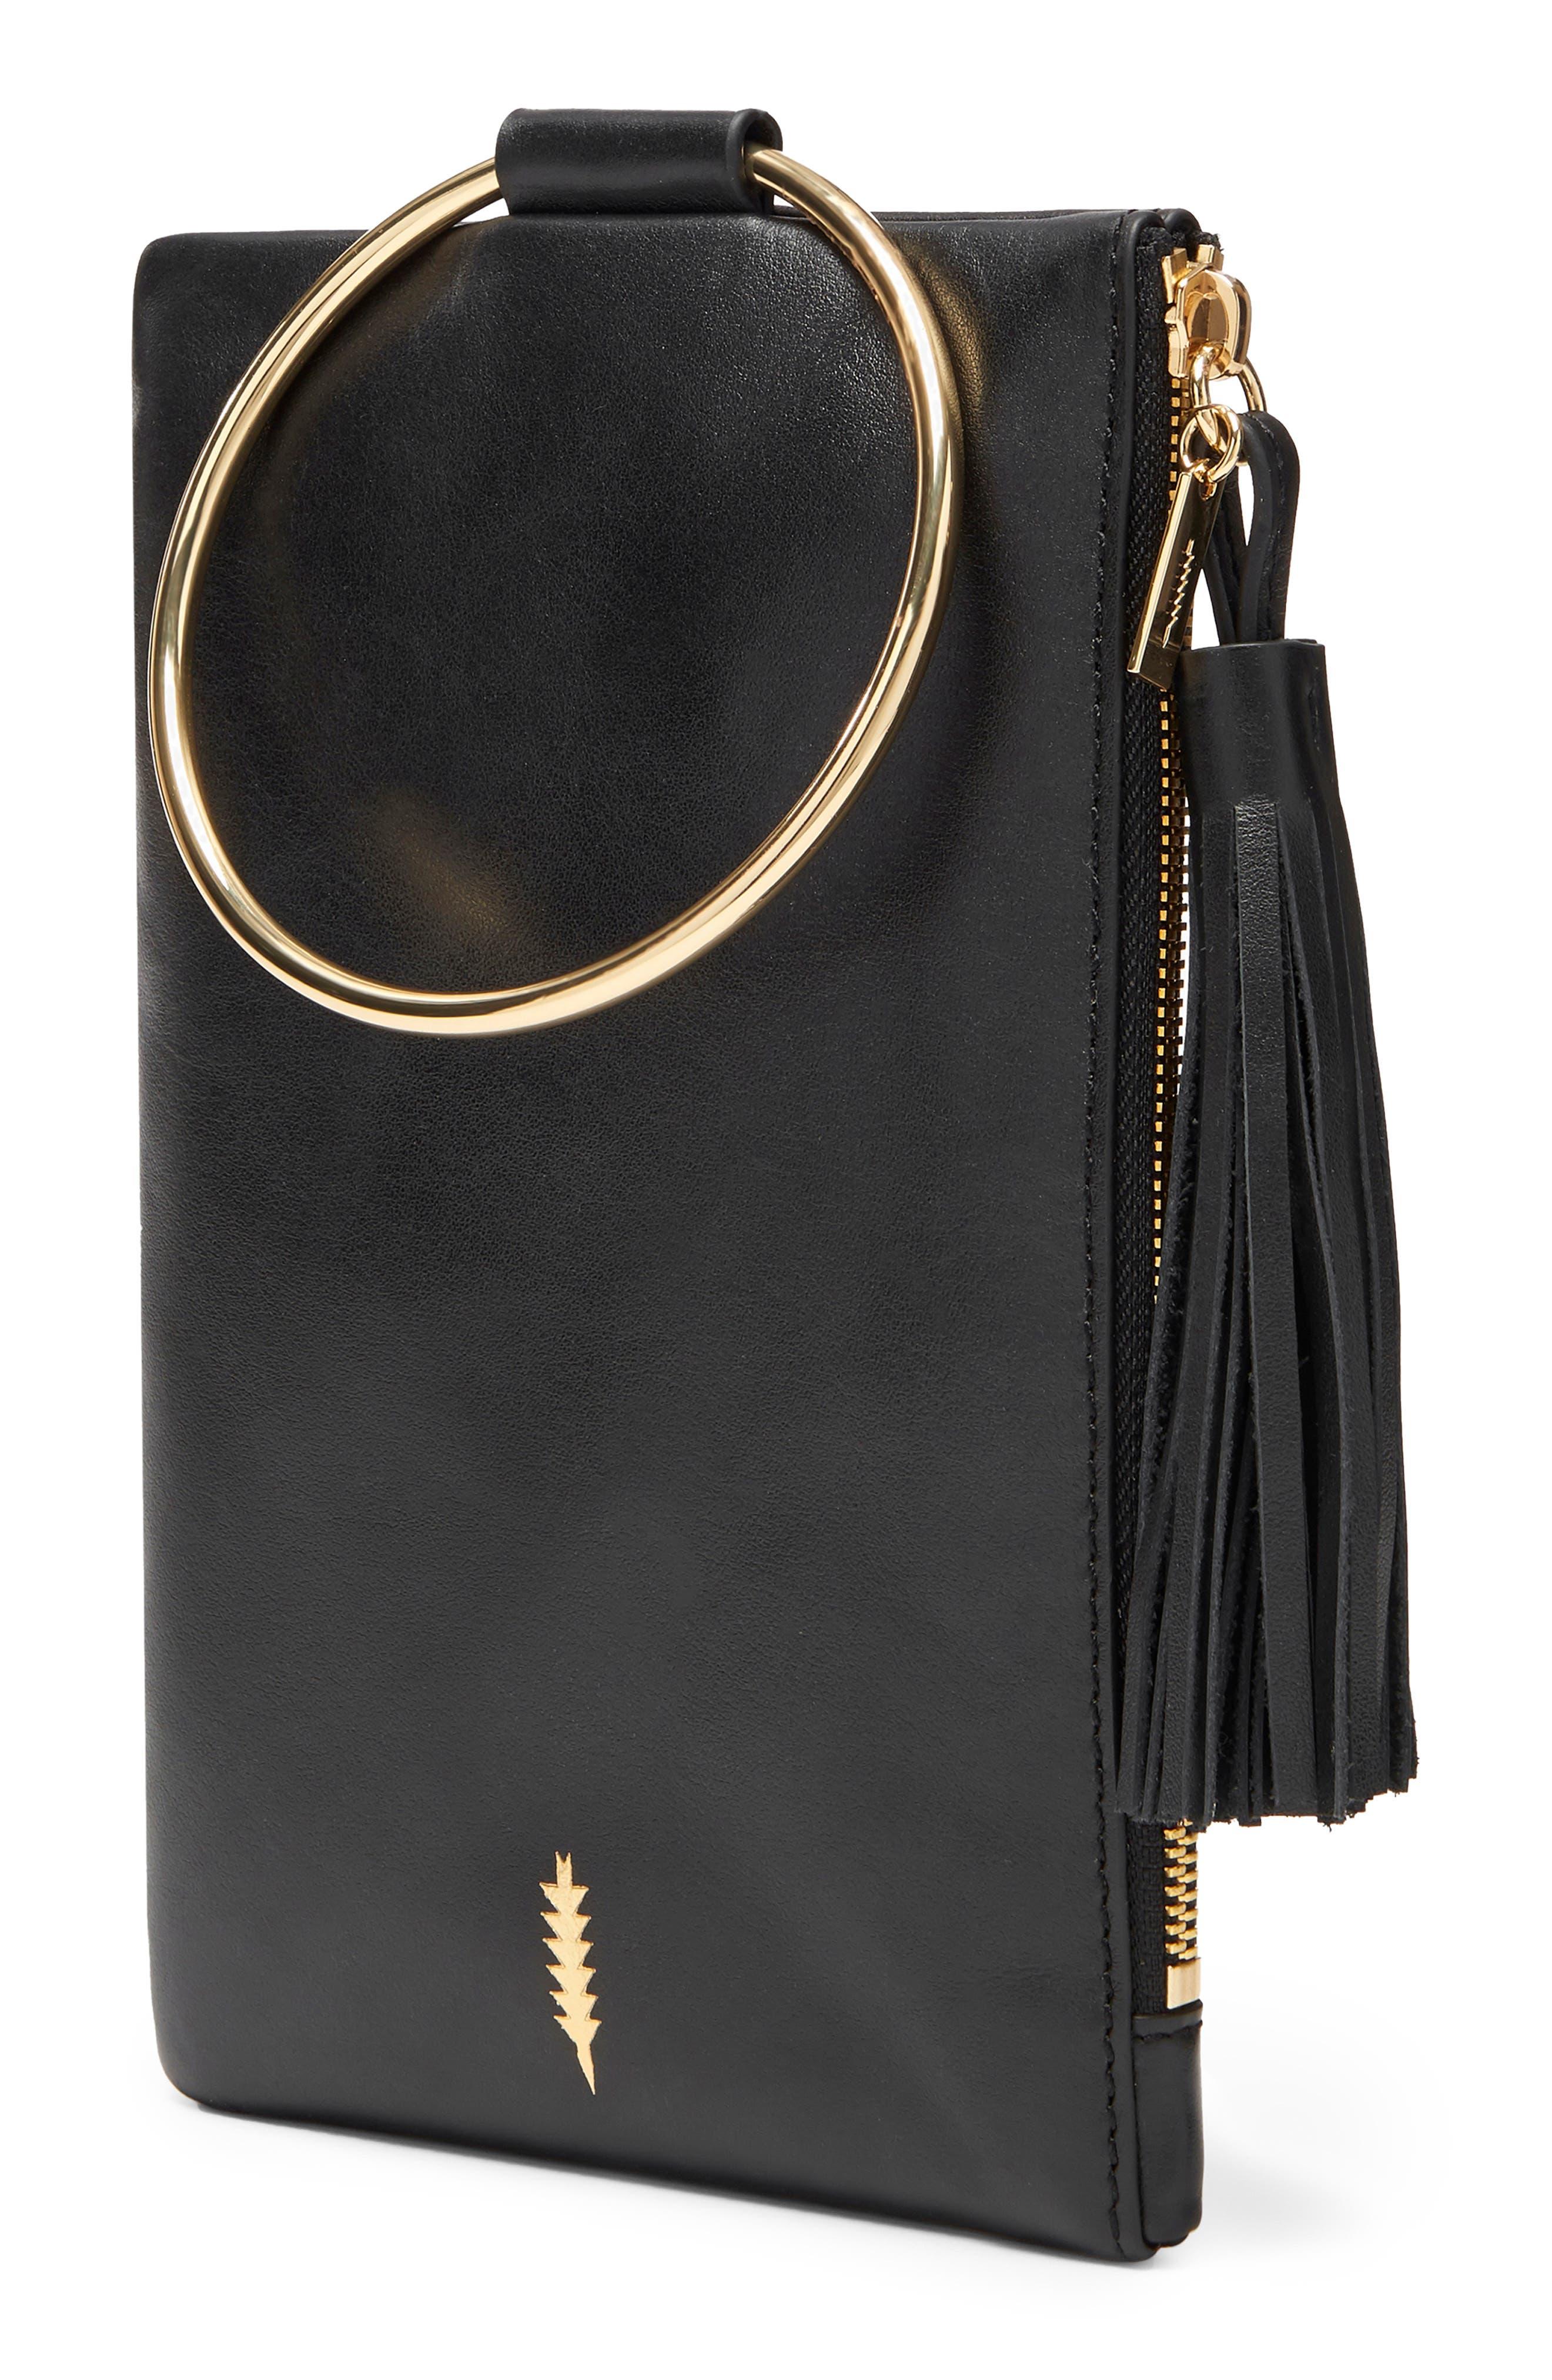 Nolita Ring Handle Leather Clutch,                             Alternate thumbnail 4, color,                             BLACK GOLD